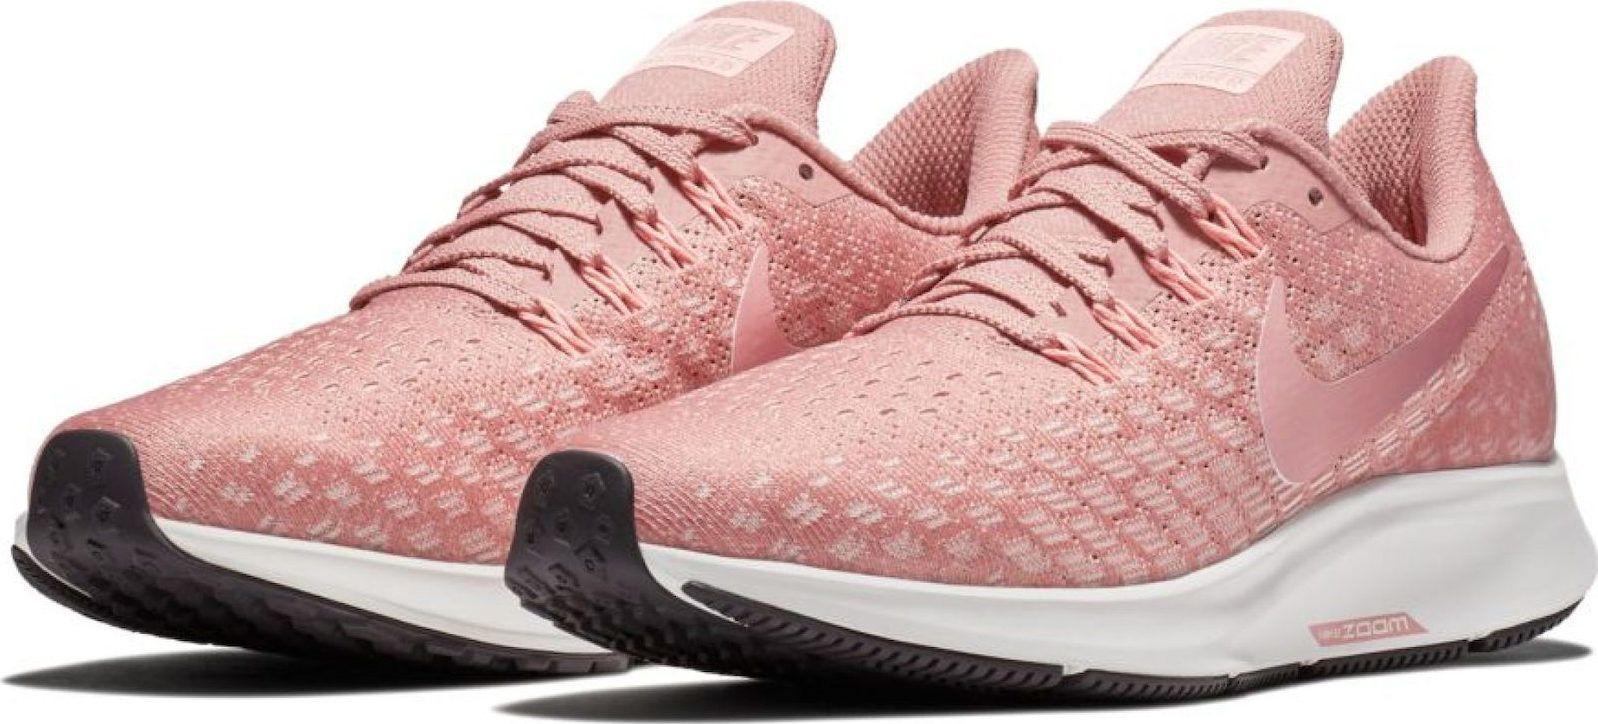 15c61ae652 Nike Air Zoom Pegasus 35 942855-603 - Skroutz.gr Αθλητικά Παπούτσια Adidas